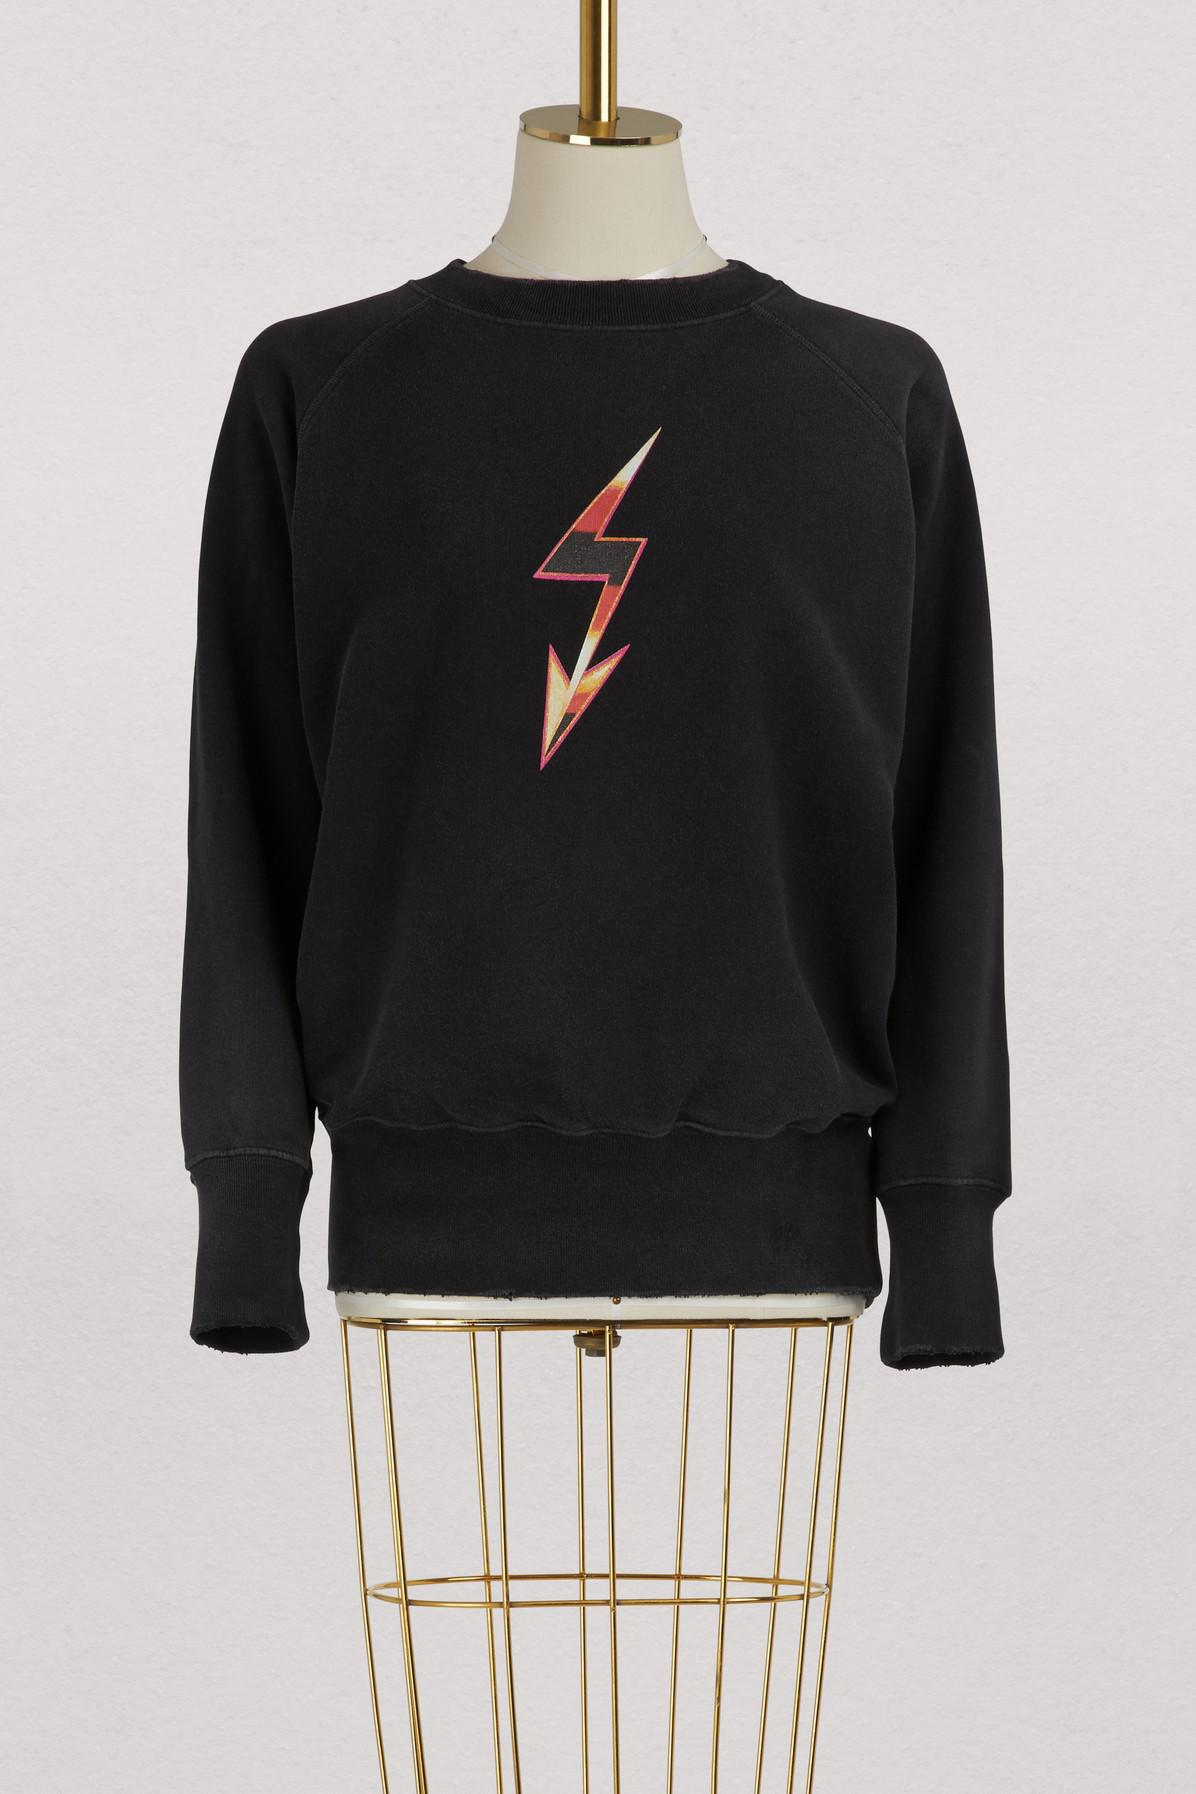 Mad Love Tour sweatshirt Givenchy Sale Low Price oVqgE2